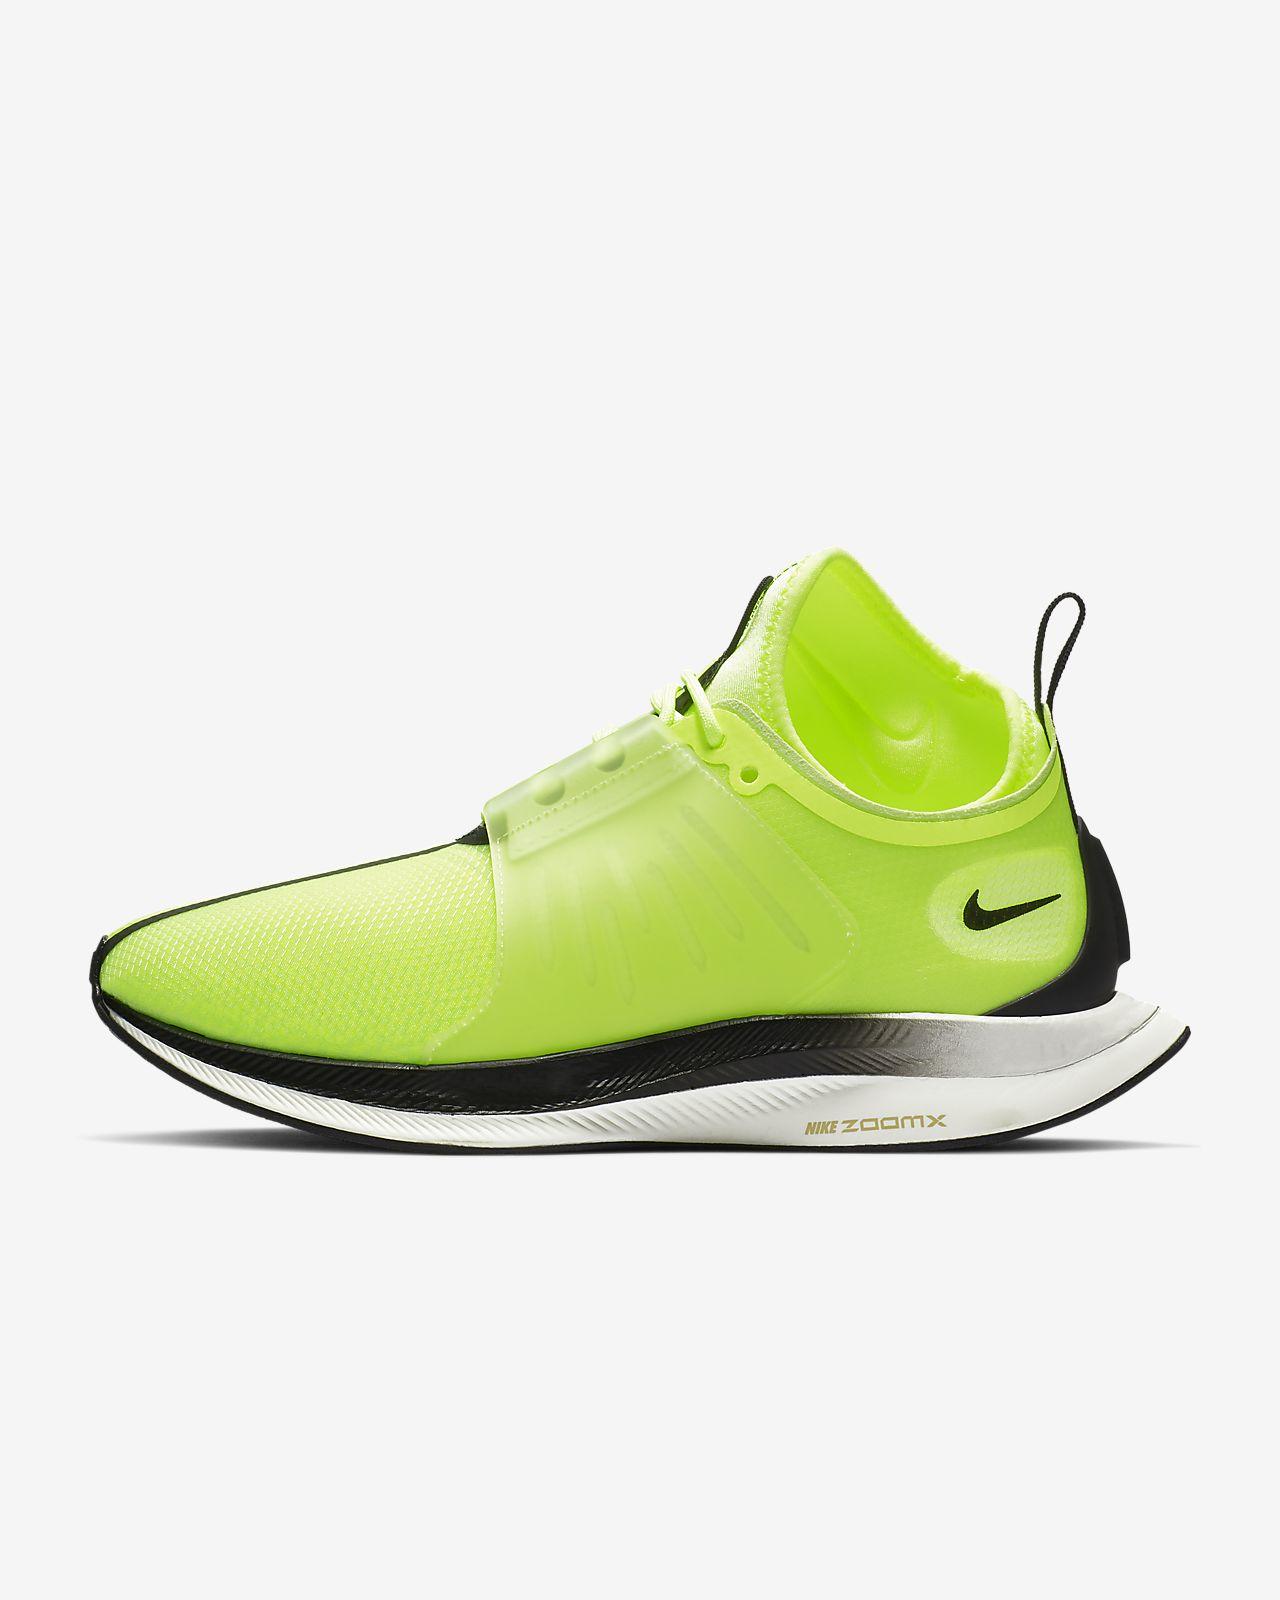 Sapatilhas de running Nike Zoom Pegasus Turbo XX para mulher